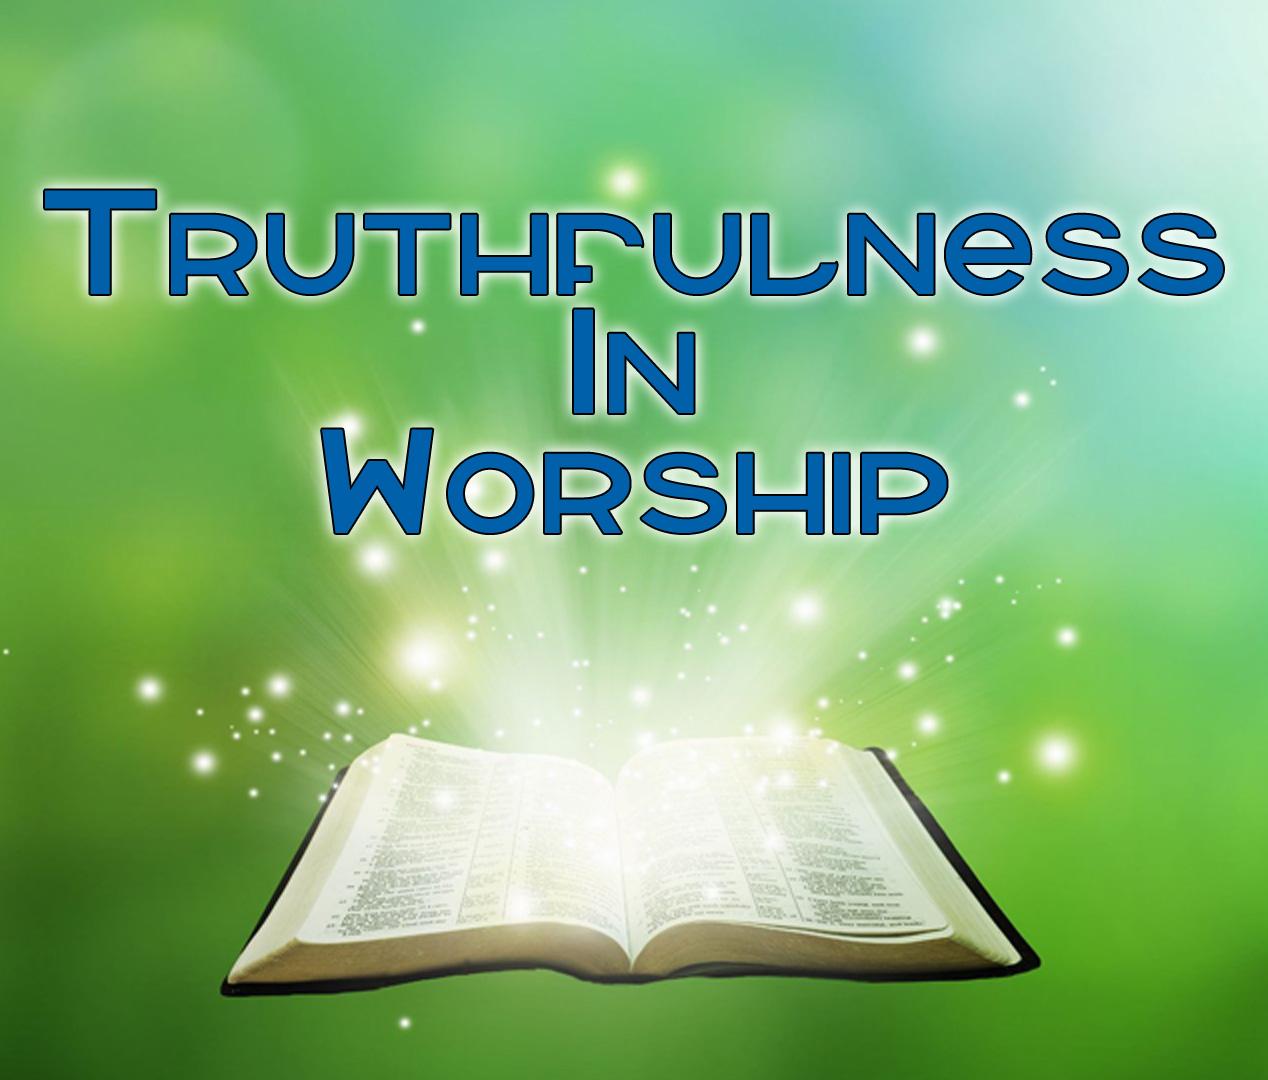 Truthfulness in Worship by Rev. J. J. Kumi Duodu